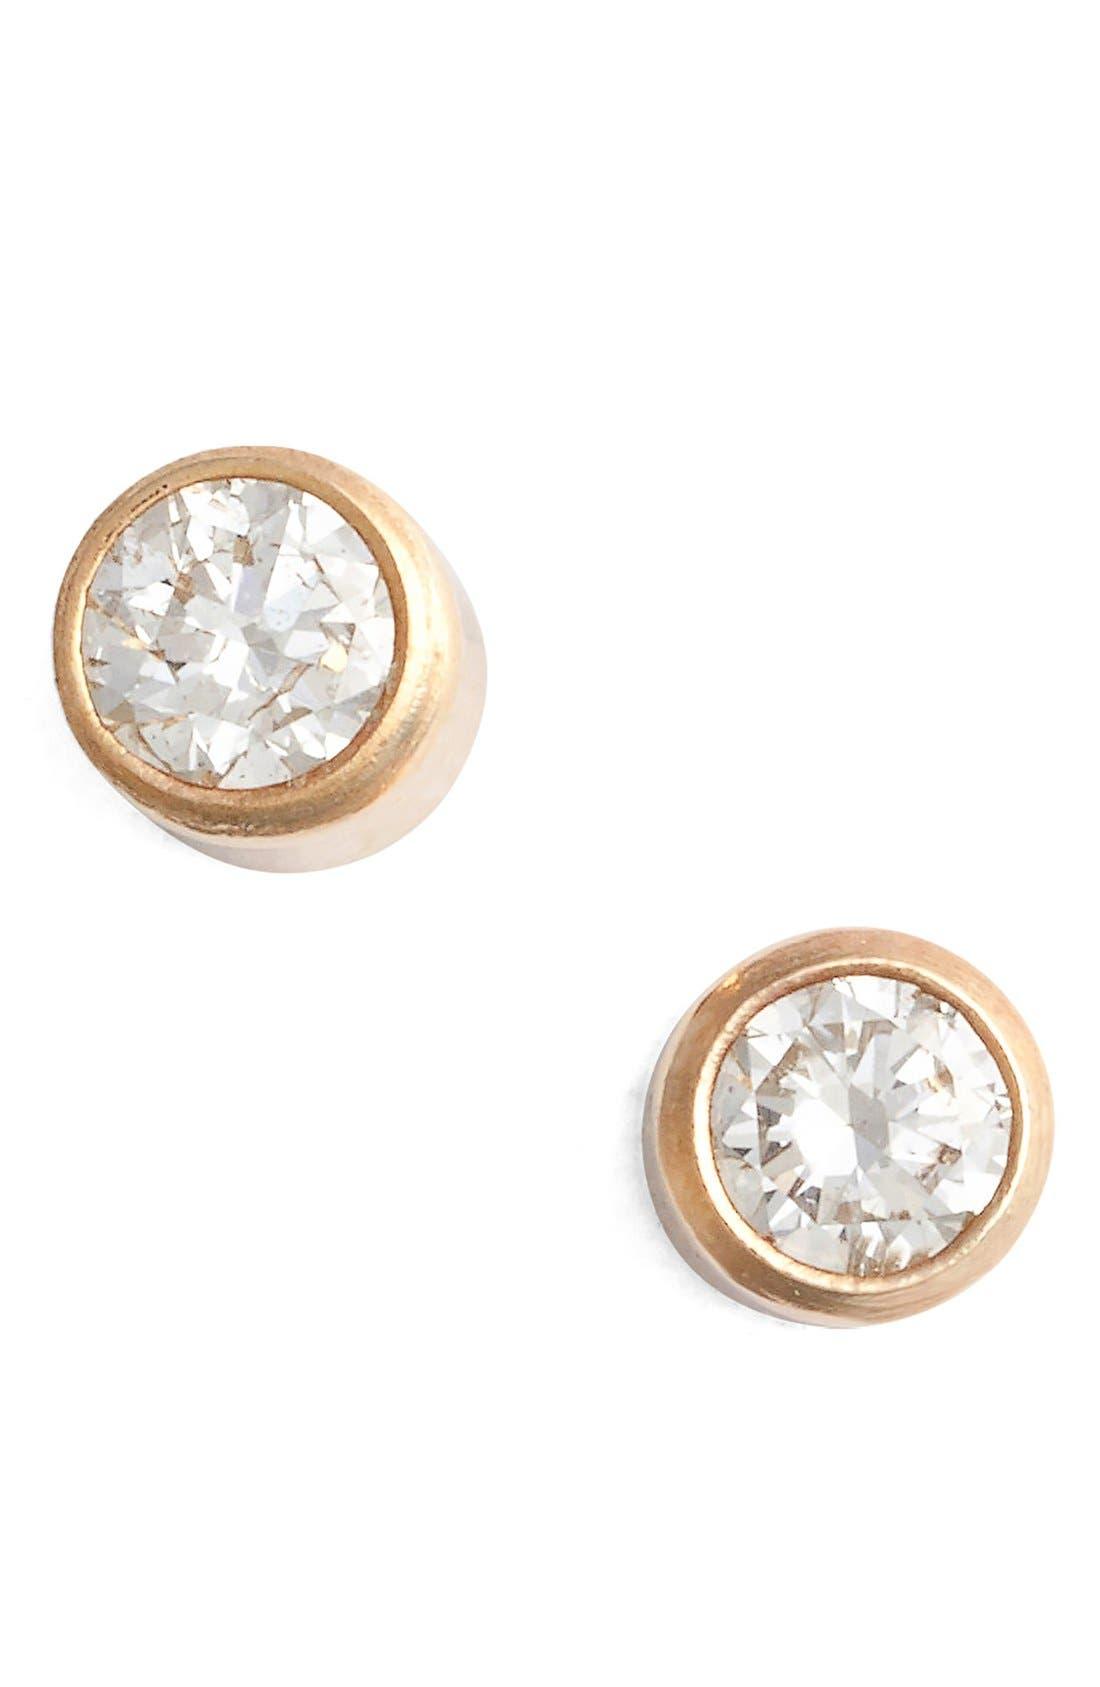 Diamond Bezel Stud Earrings,                         Main,                         color, YELLOW GOLD